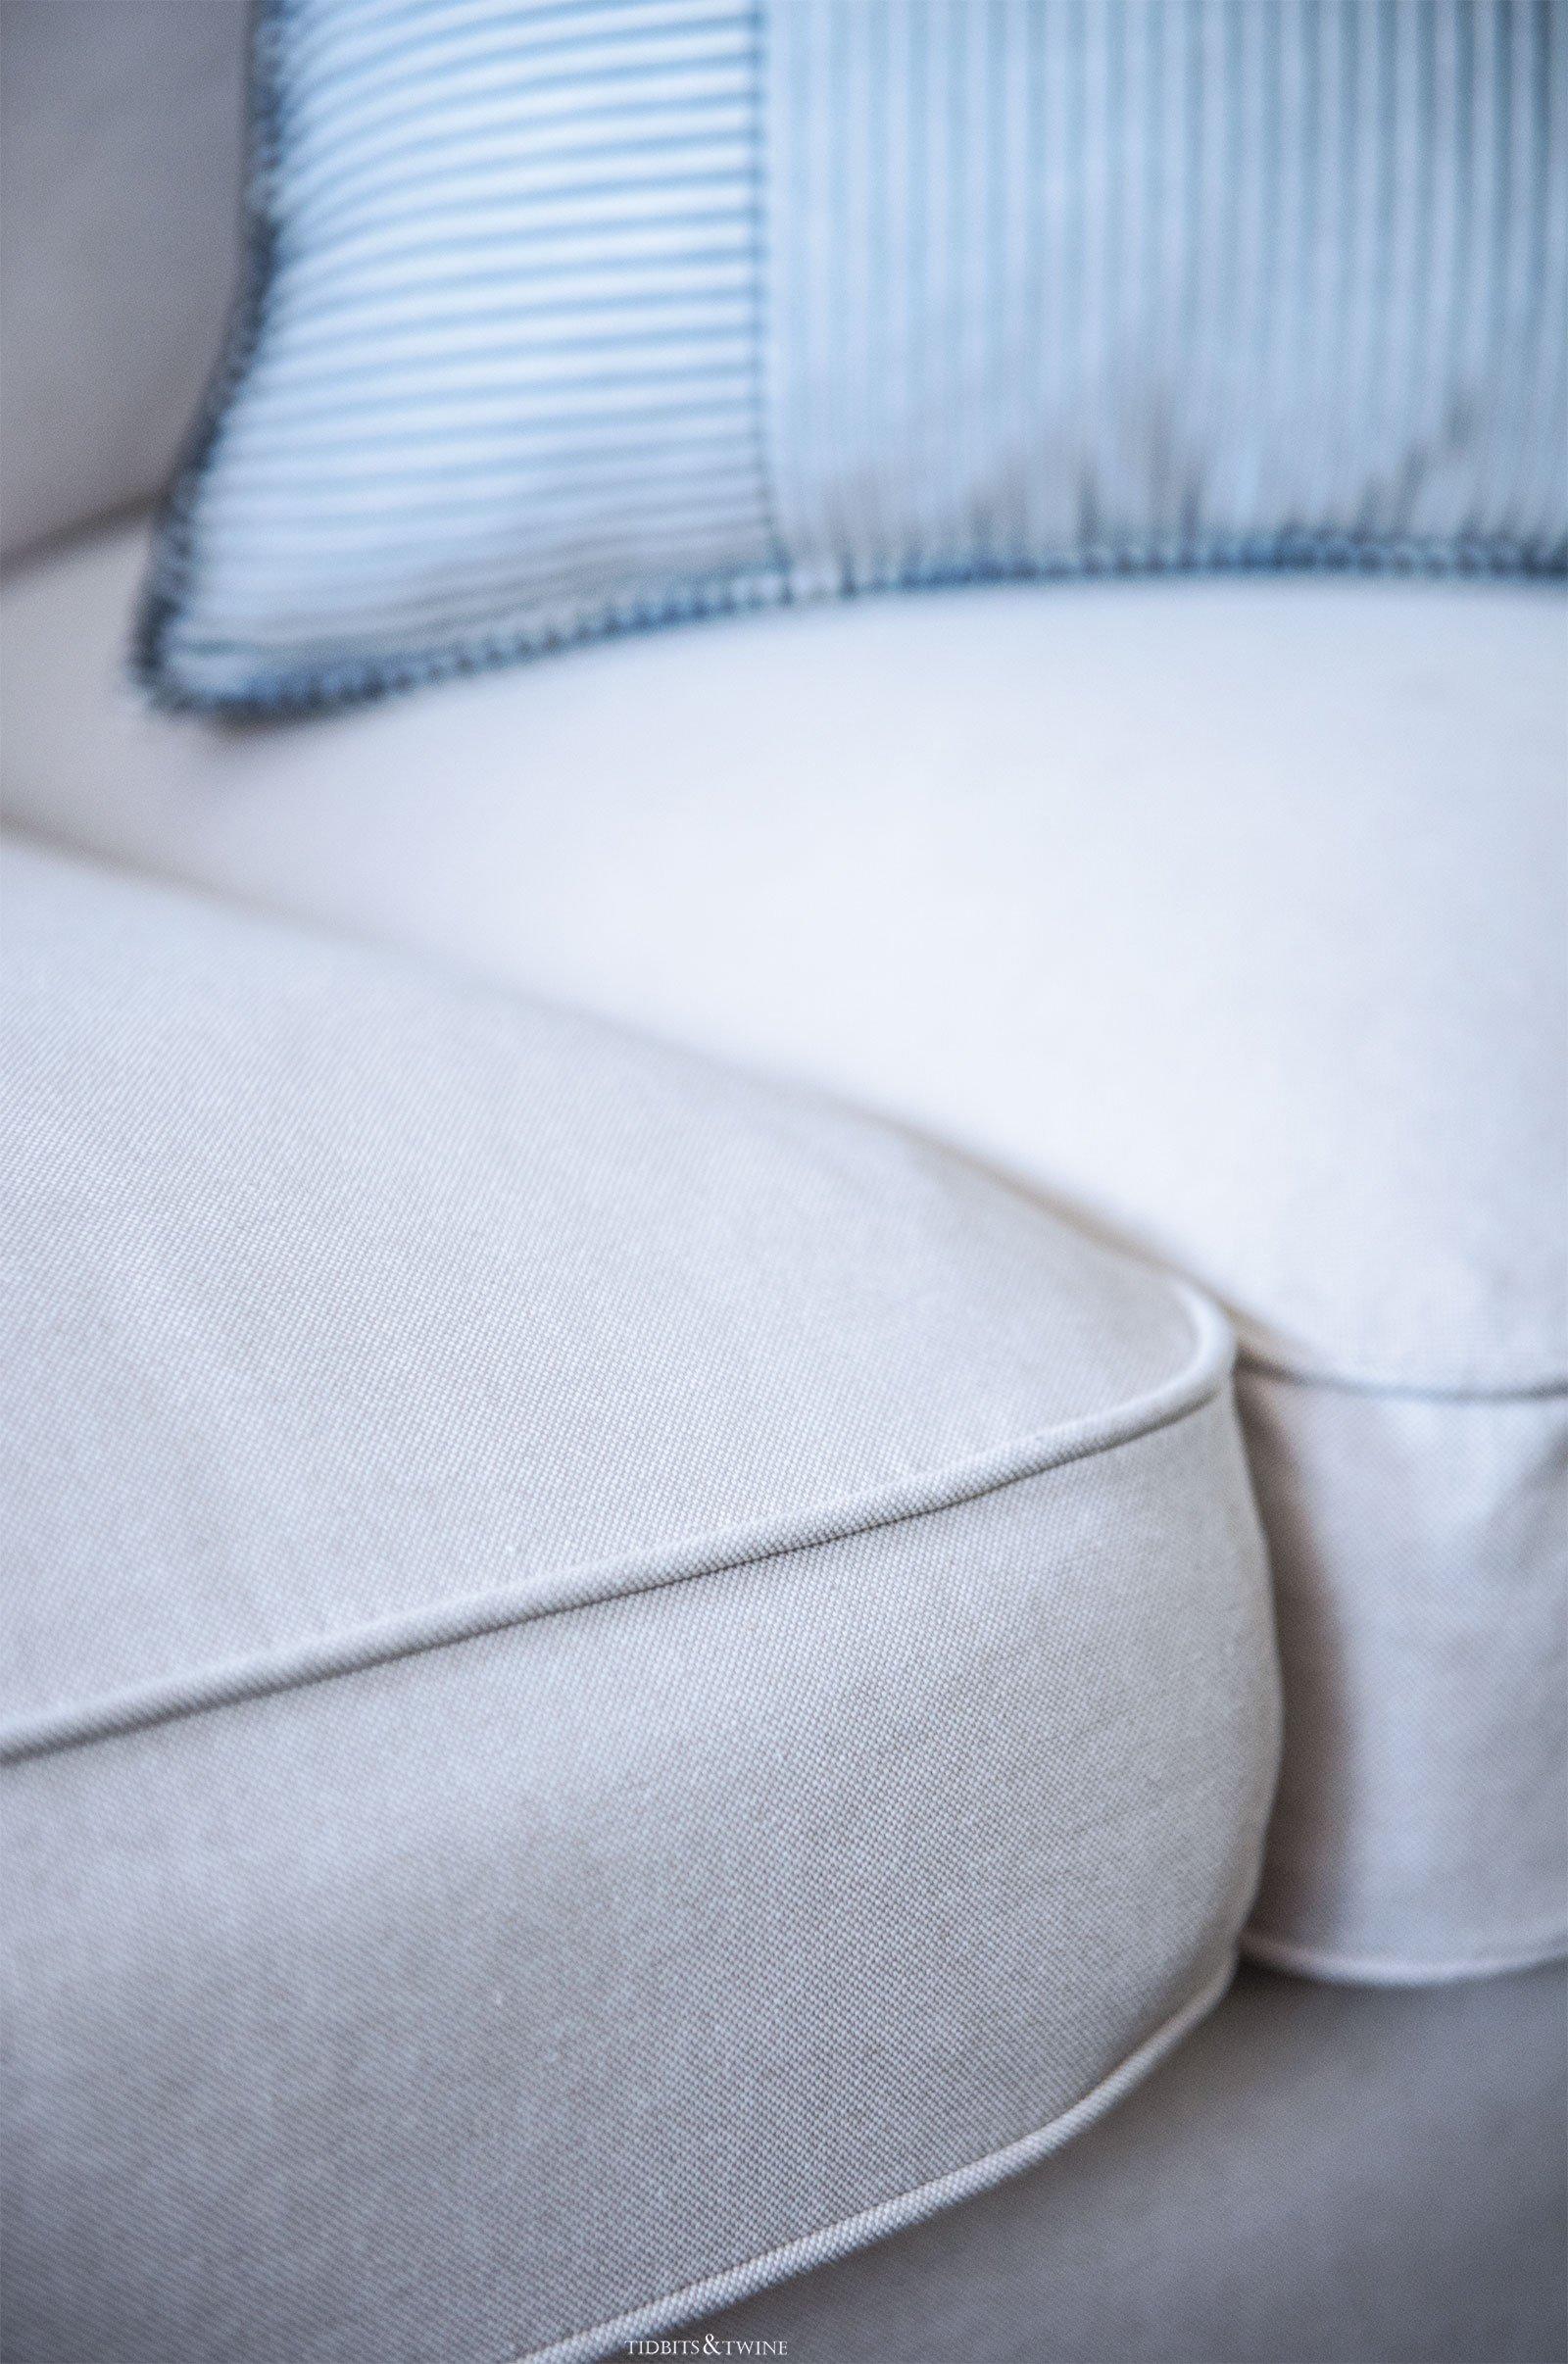 IKEA EKTORP Sofa Quality Lofallet Beige - Tidbits&Twine